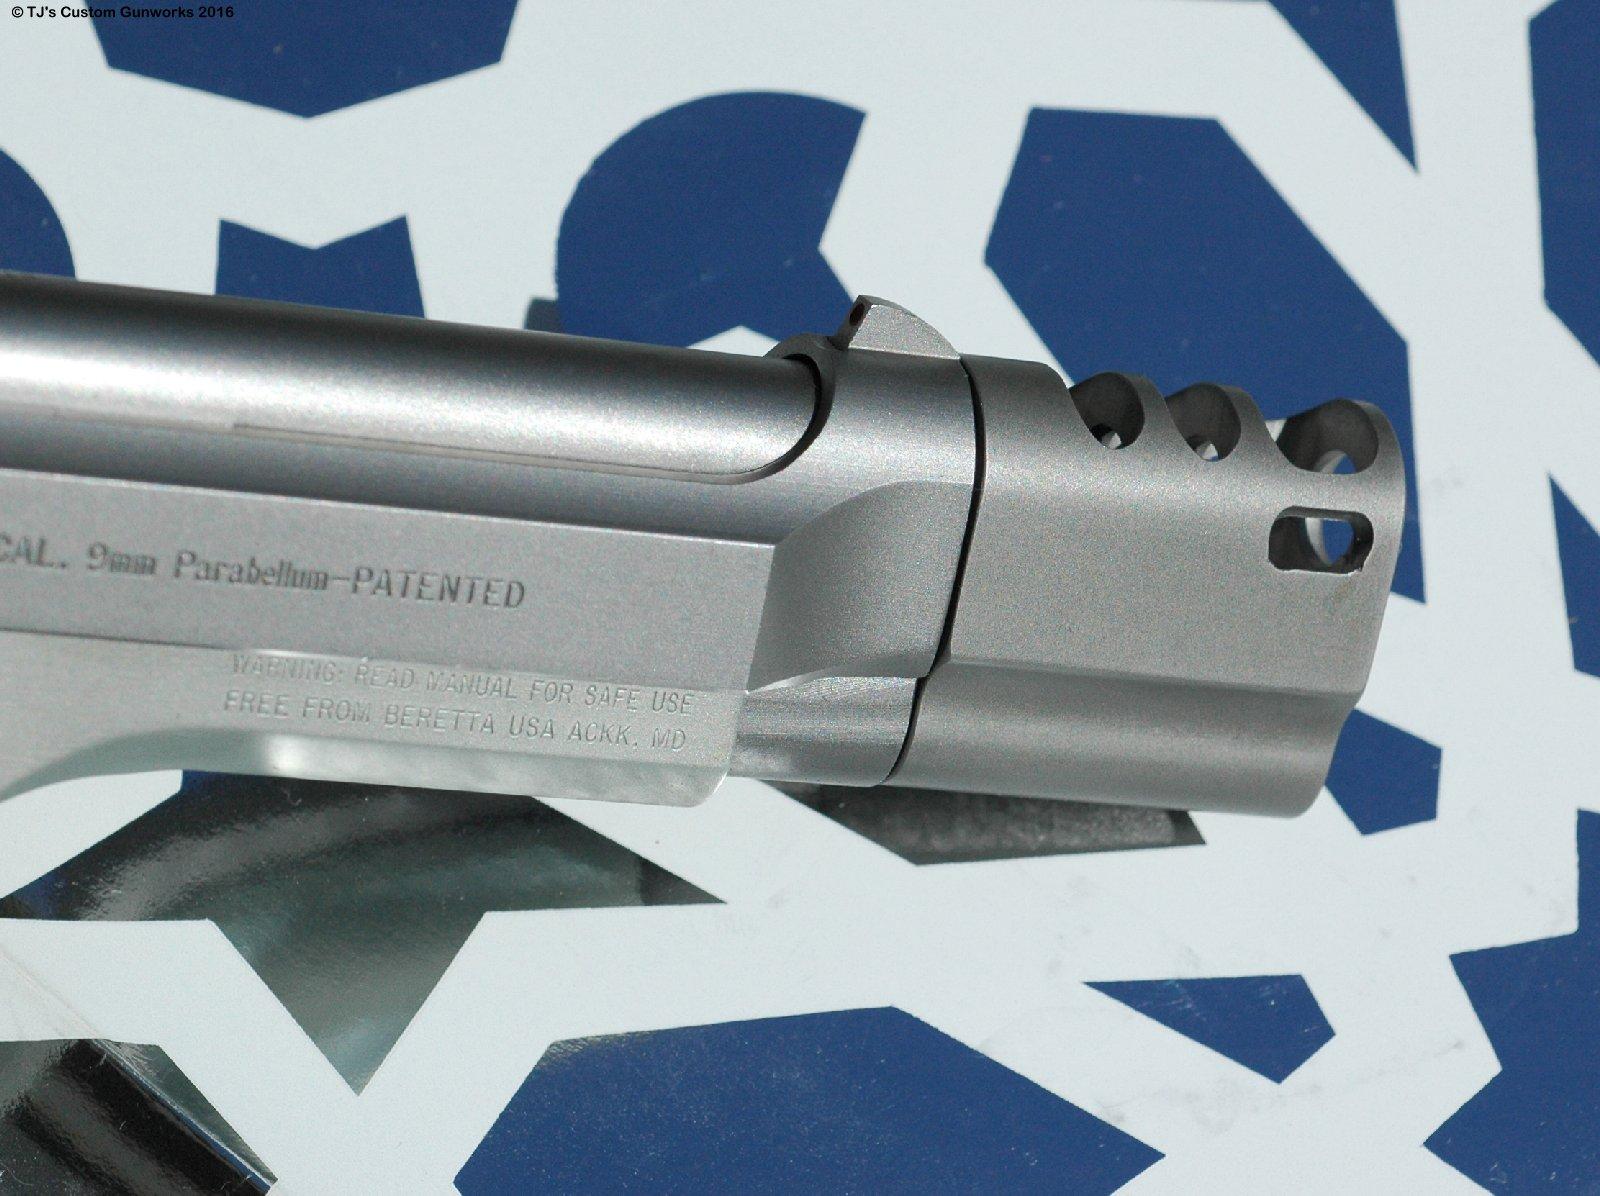 Custom Compensated Stainless INOX Beretta 92FS 9mm